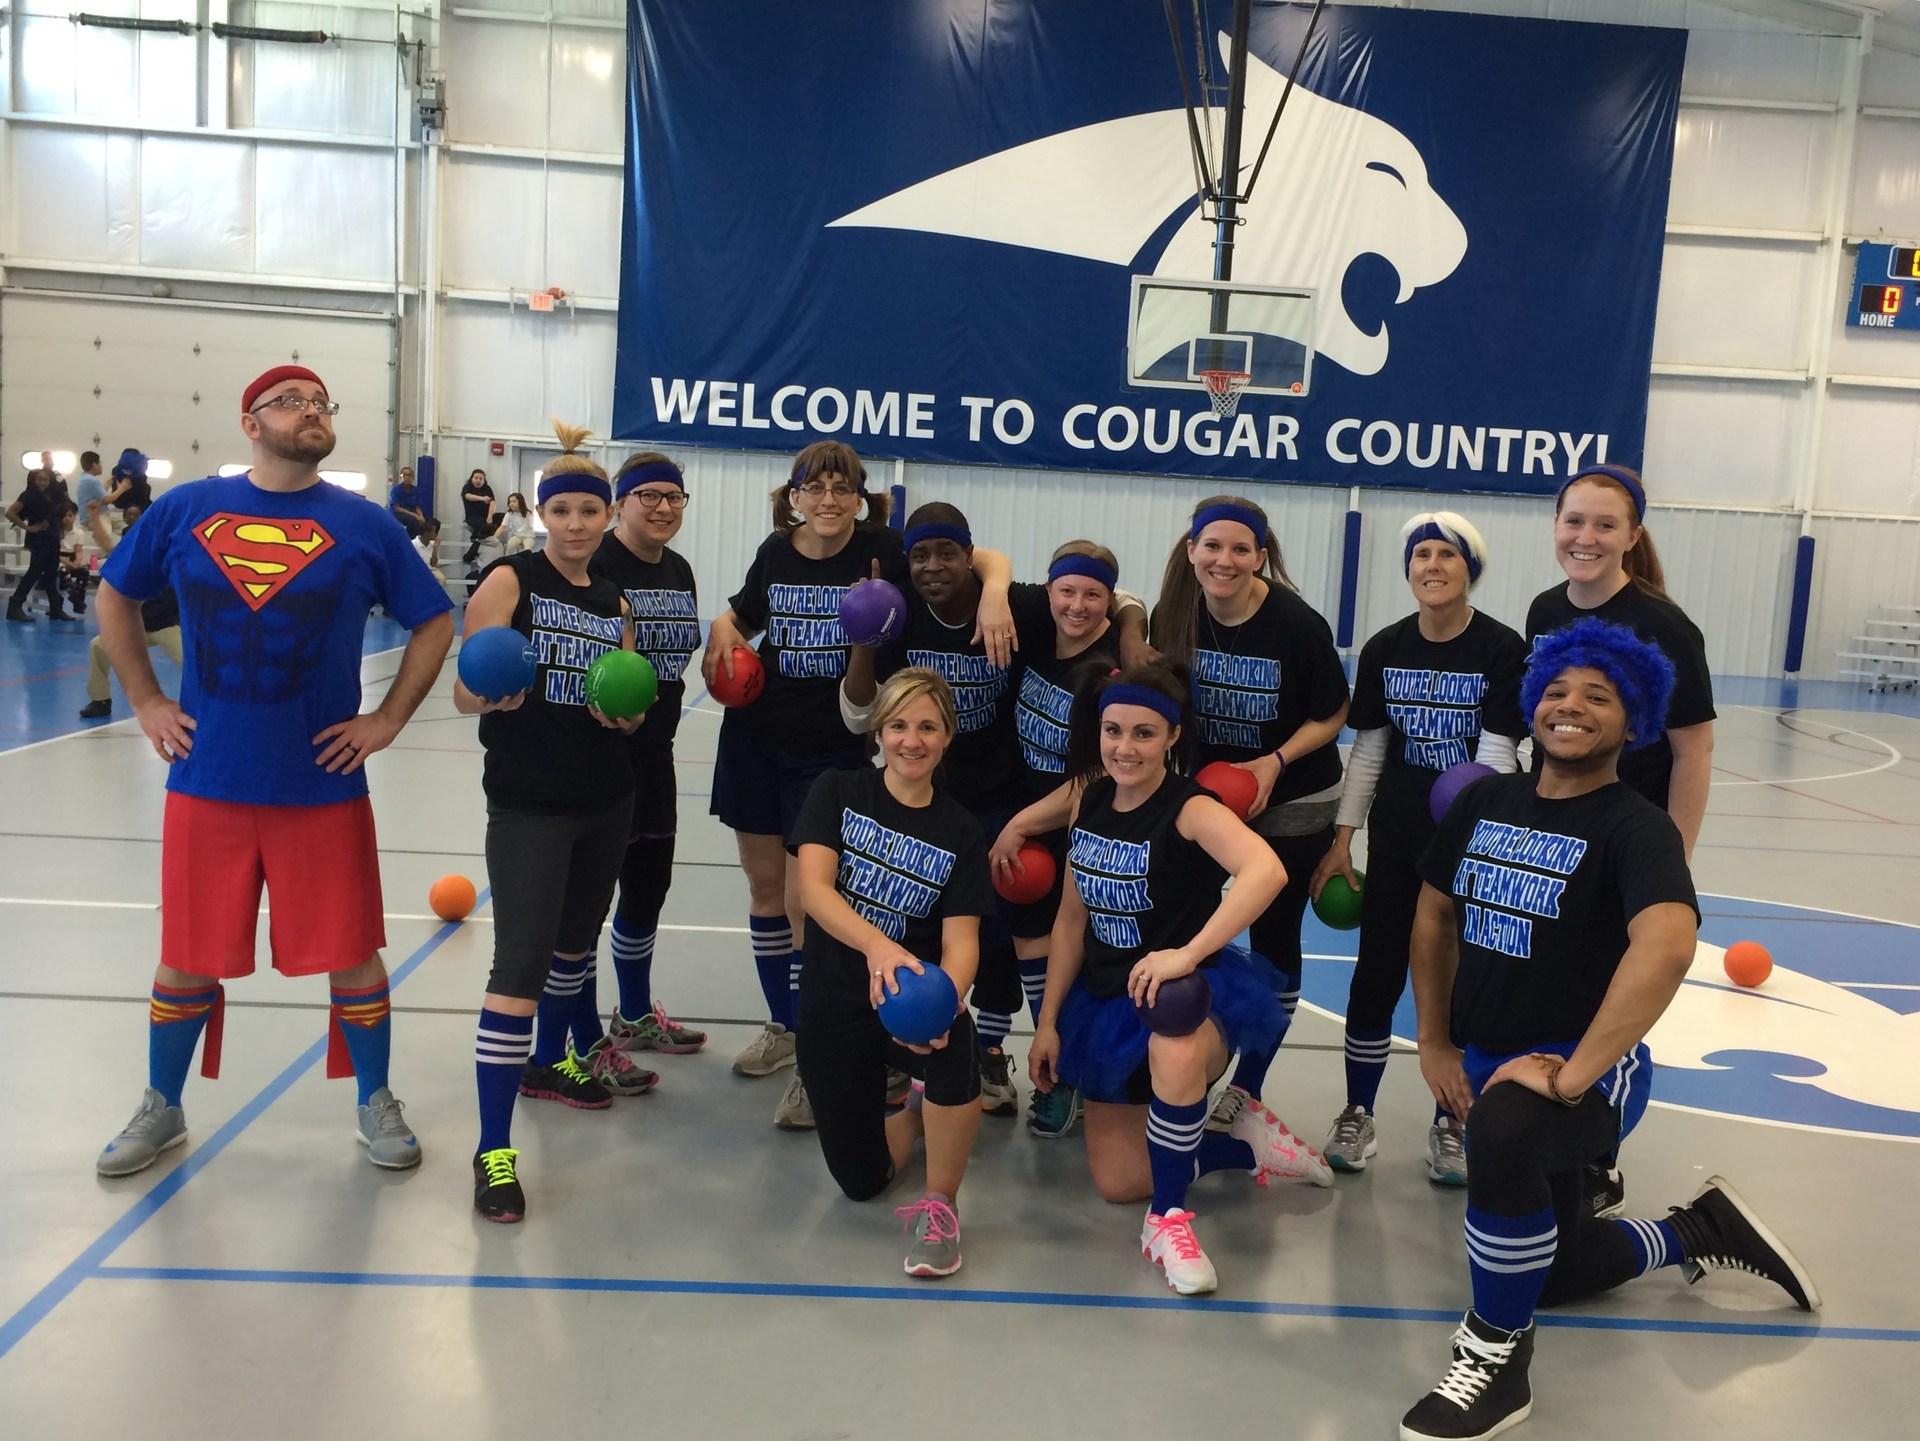 2015 Staff V. Student Dodgeball Victors - the teachers!